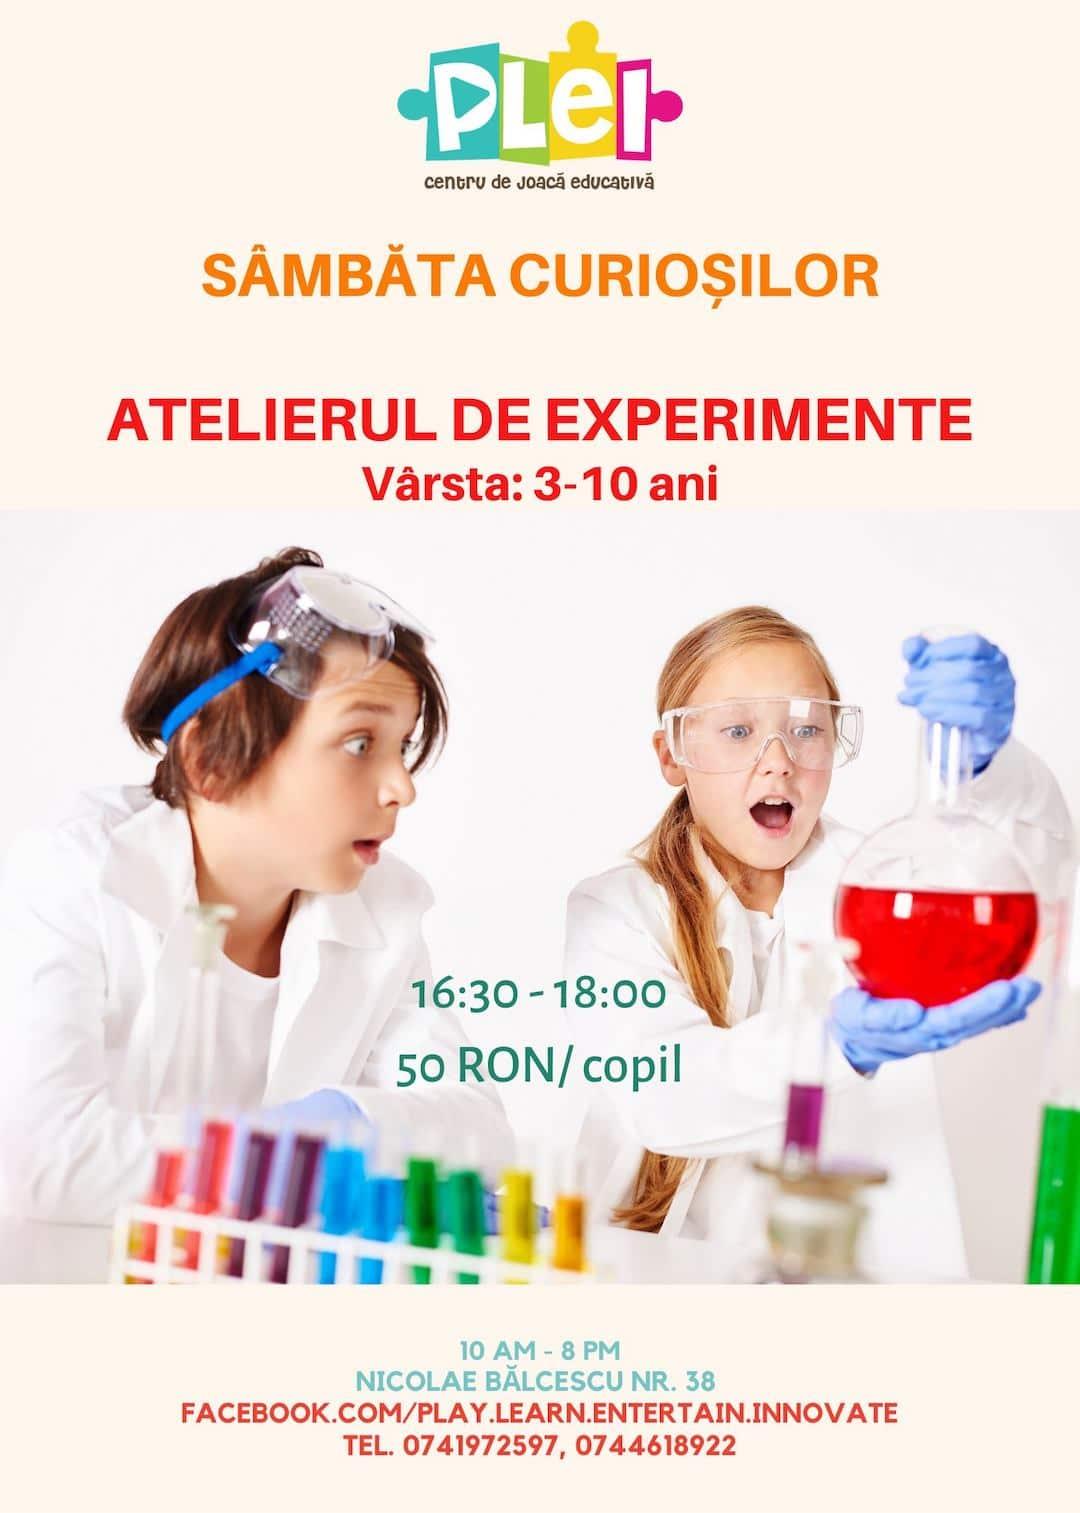 atelier de experimente